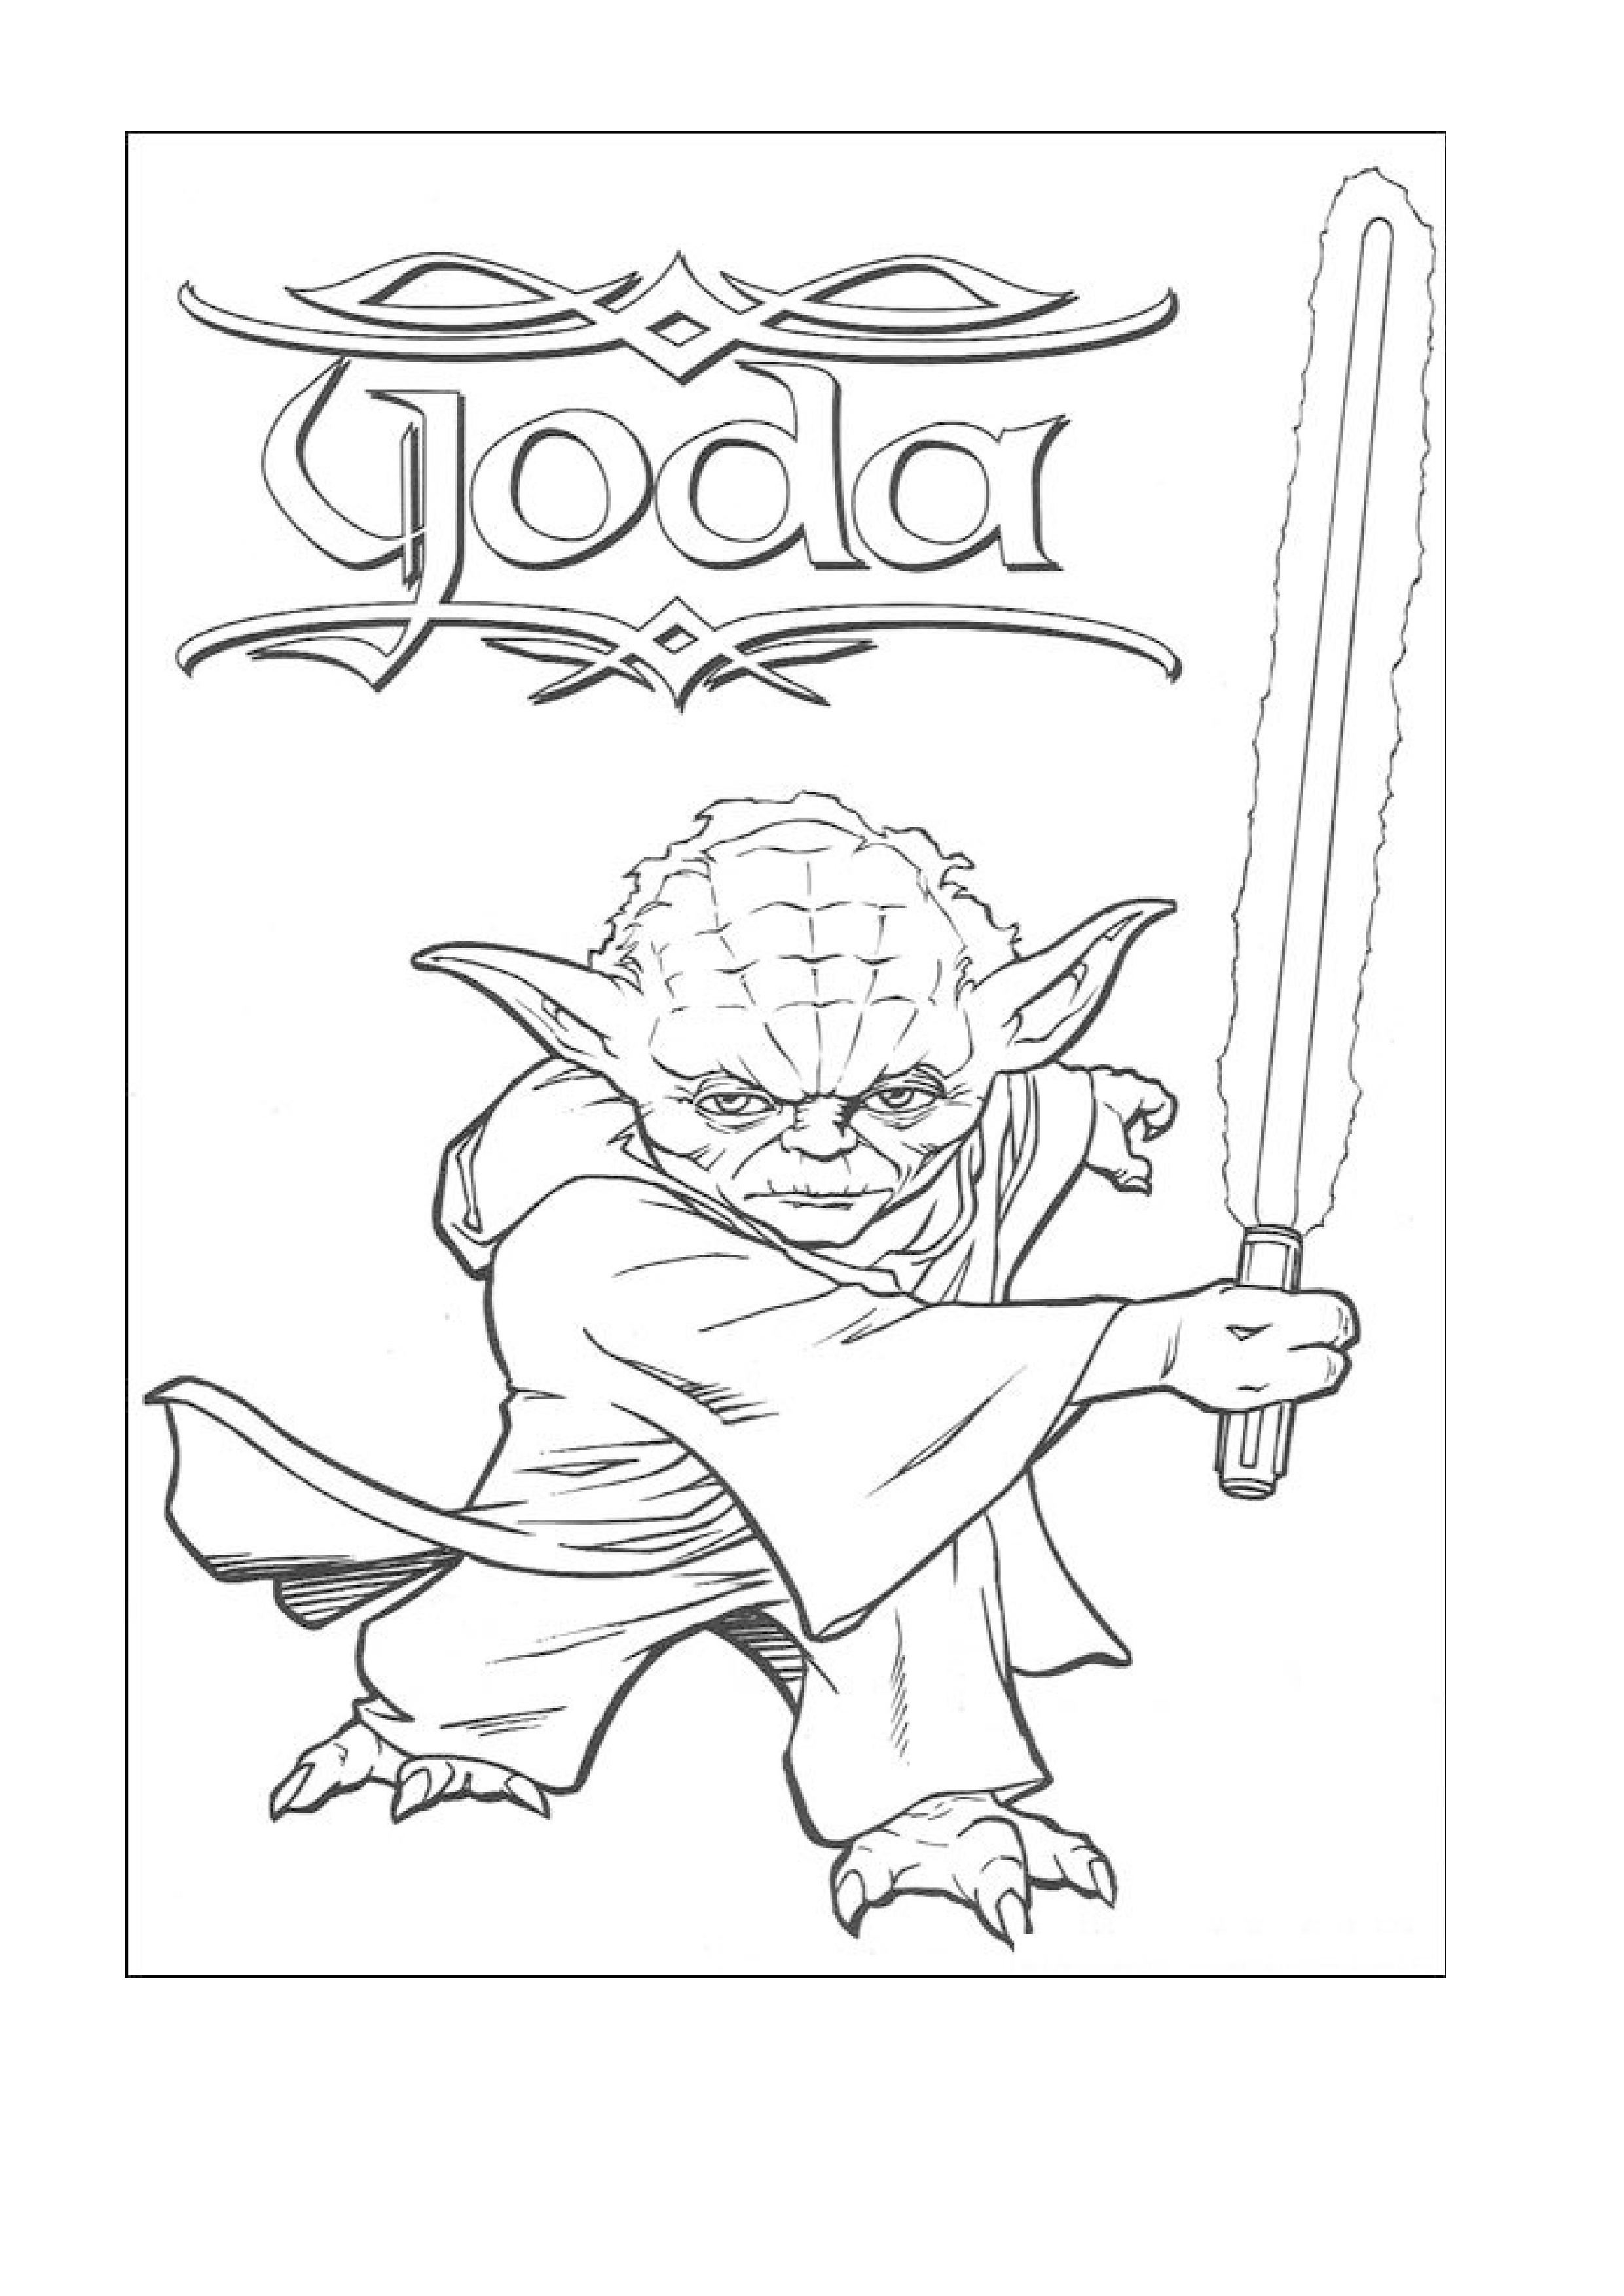 Yoda Coloring Page Free